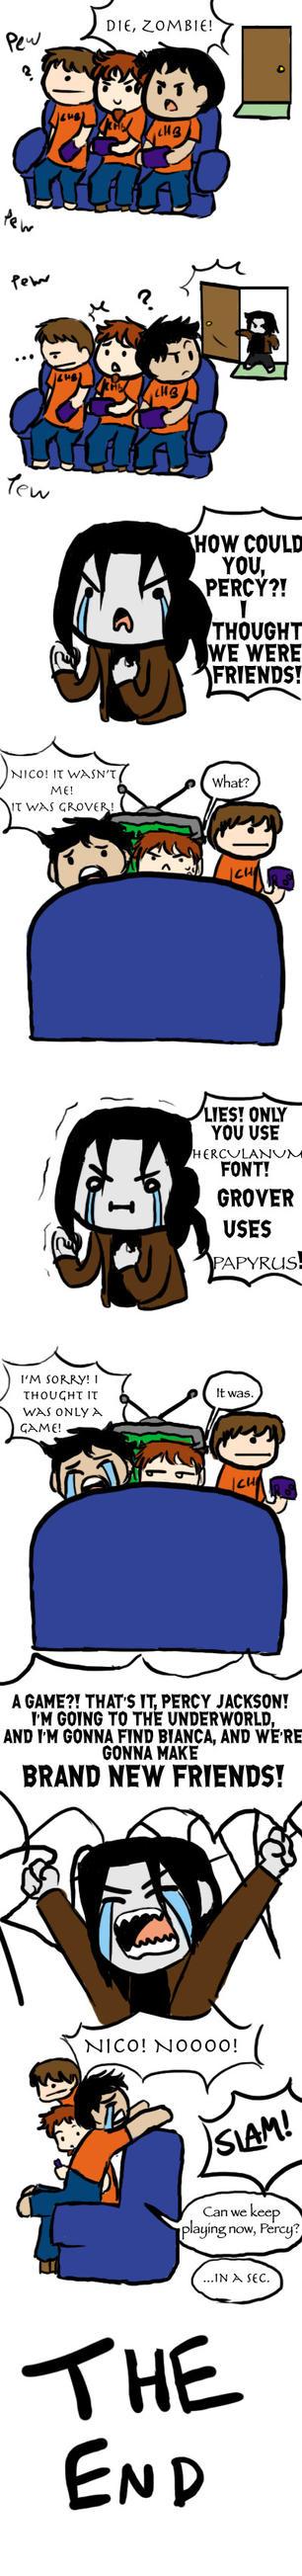 A Dumb Little Percy Jackson Comic by Kaya-chanXD